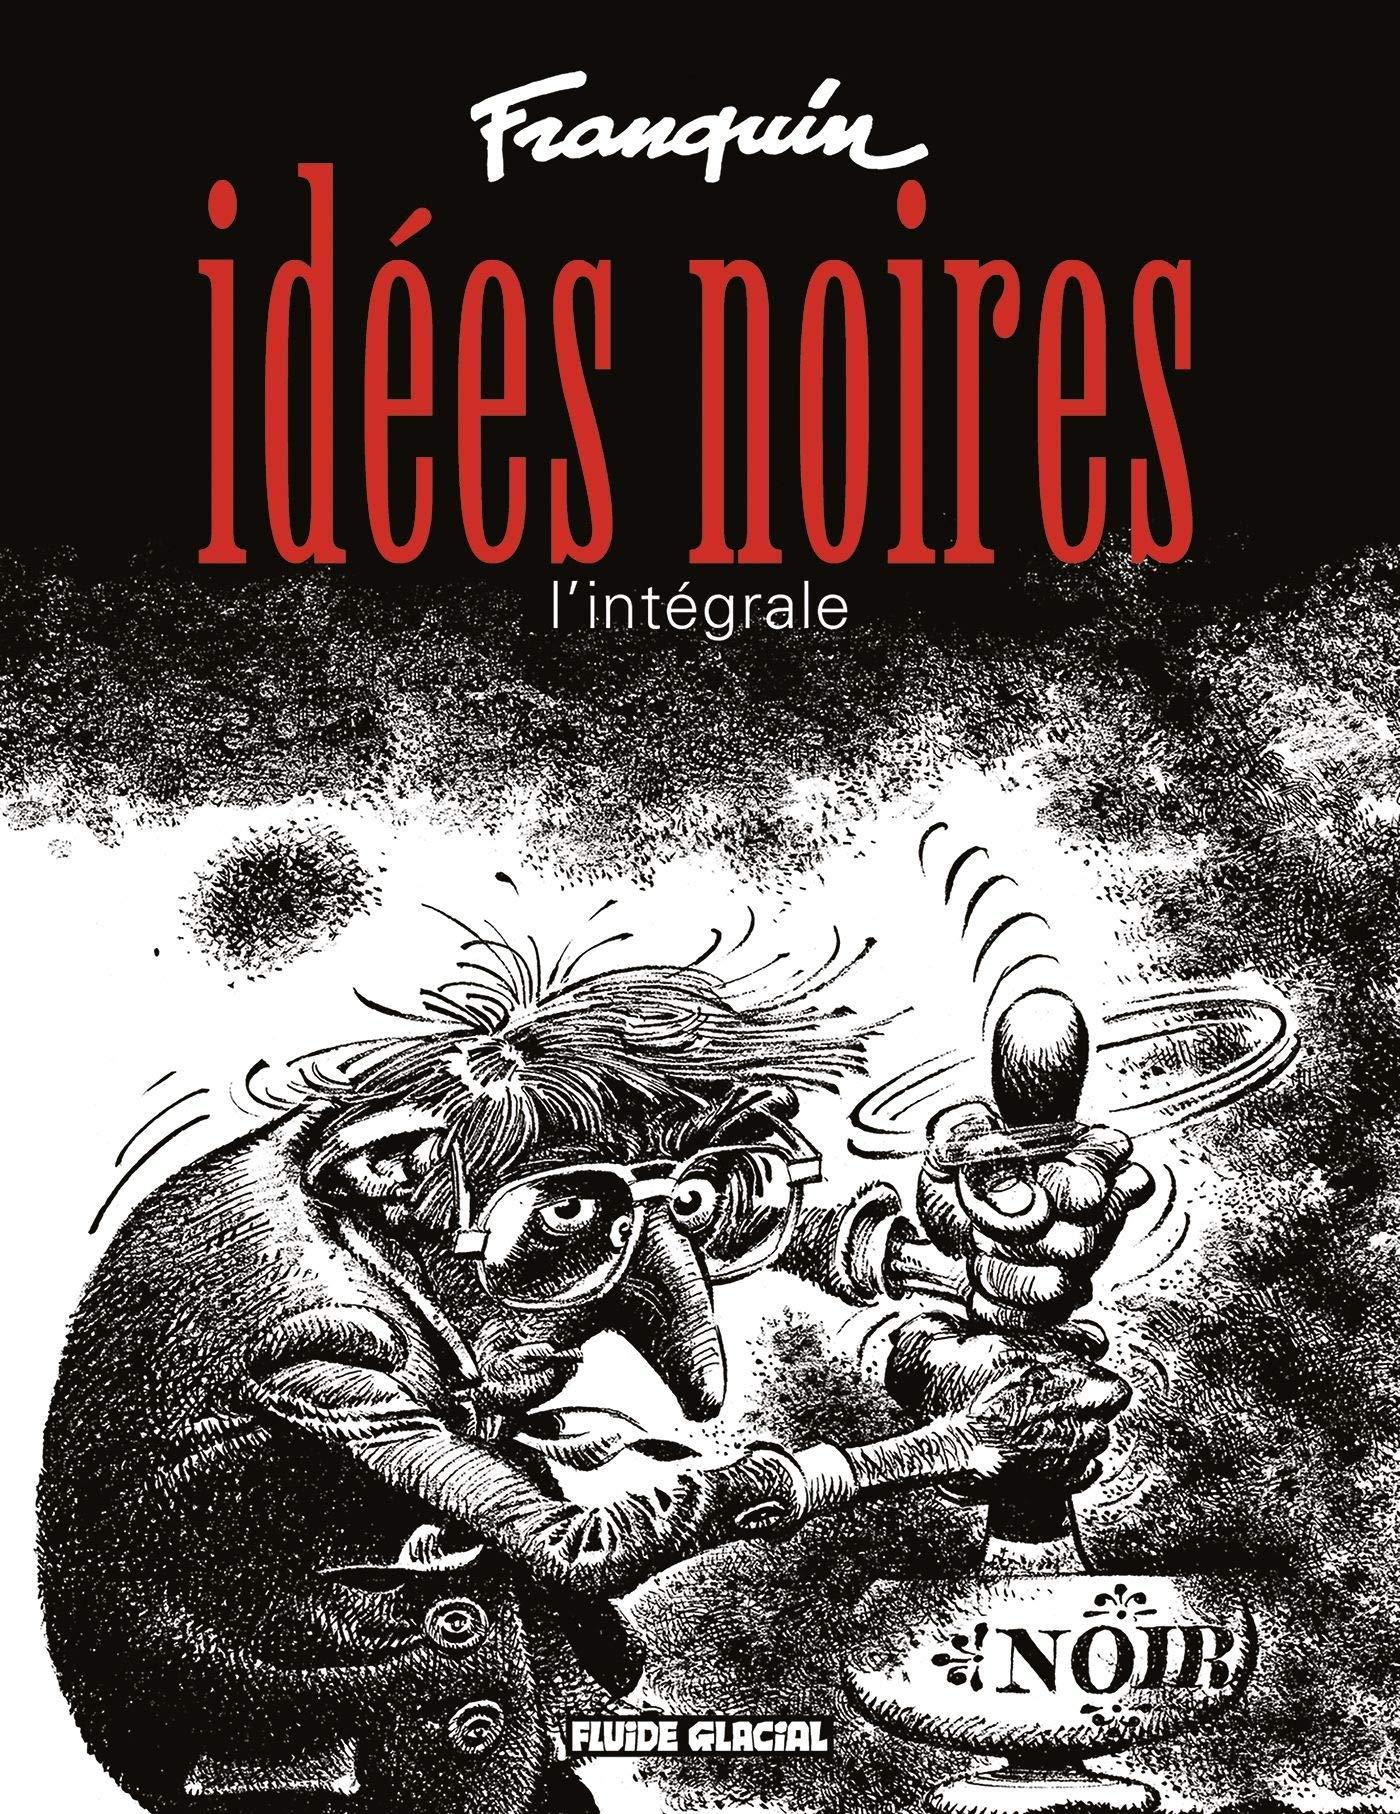 Idees Noires L Integrale Fg Fluide Glac French Edition Franquin Andre 9782858152957 Amazon Com Books